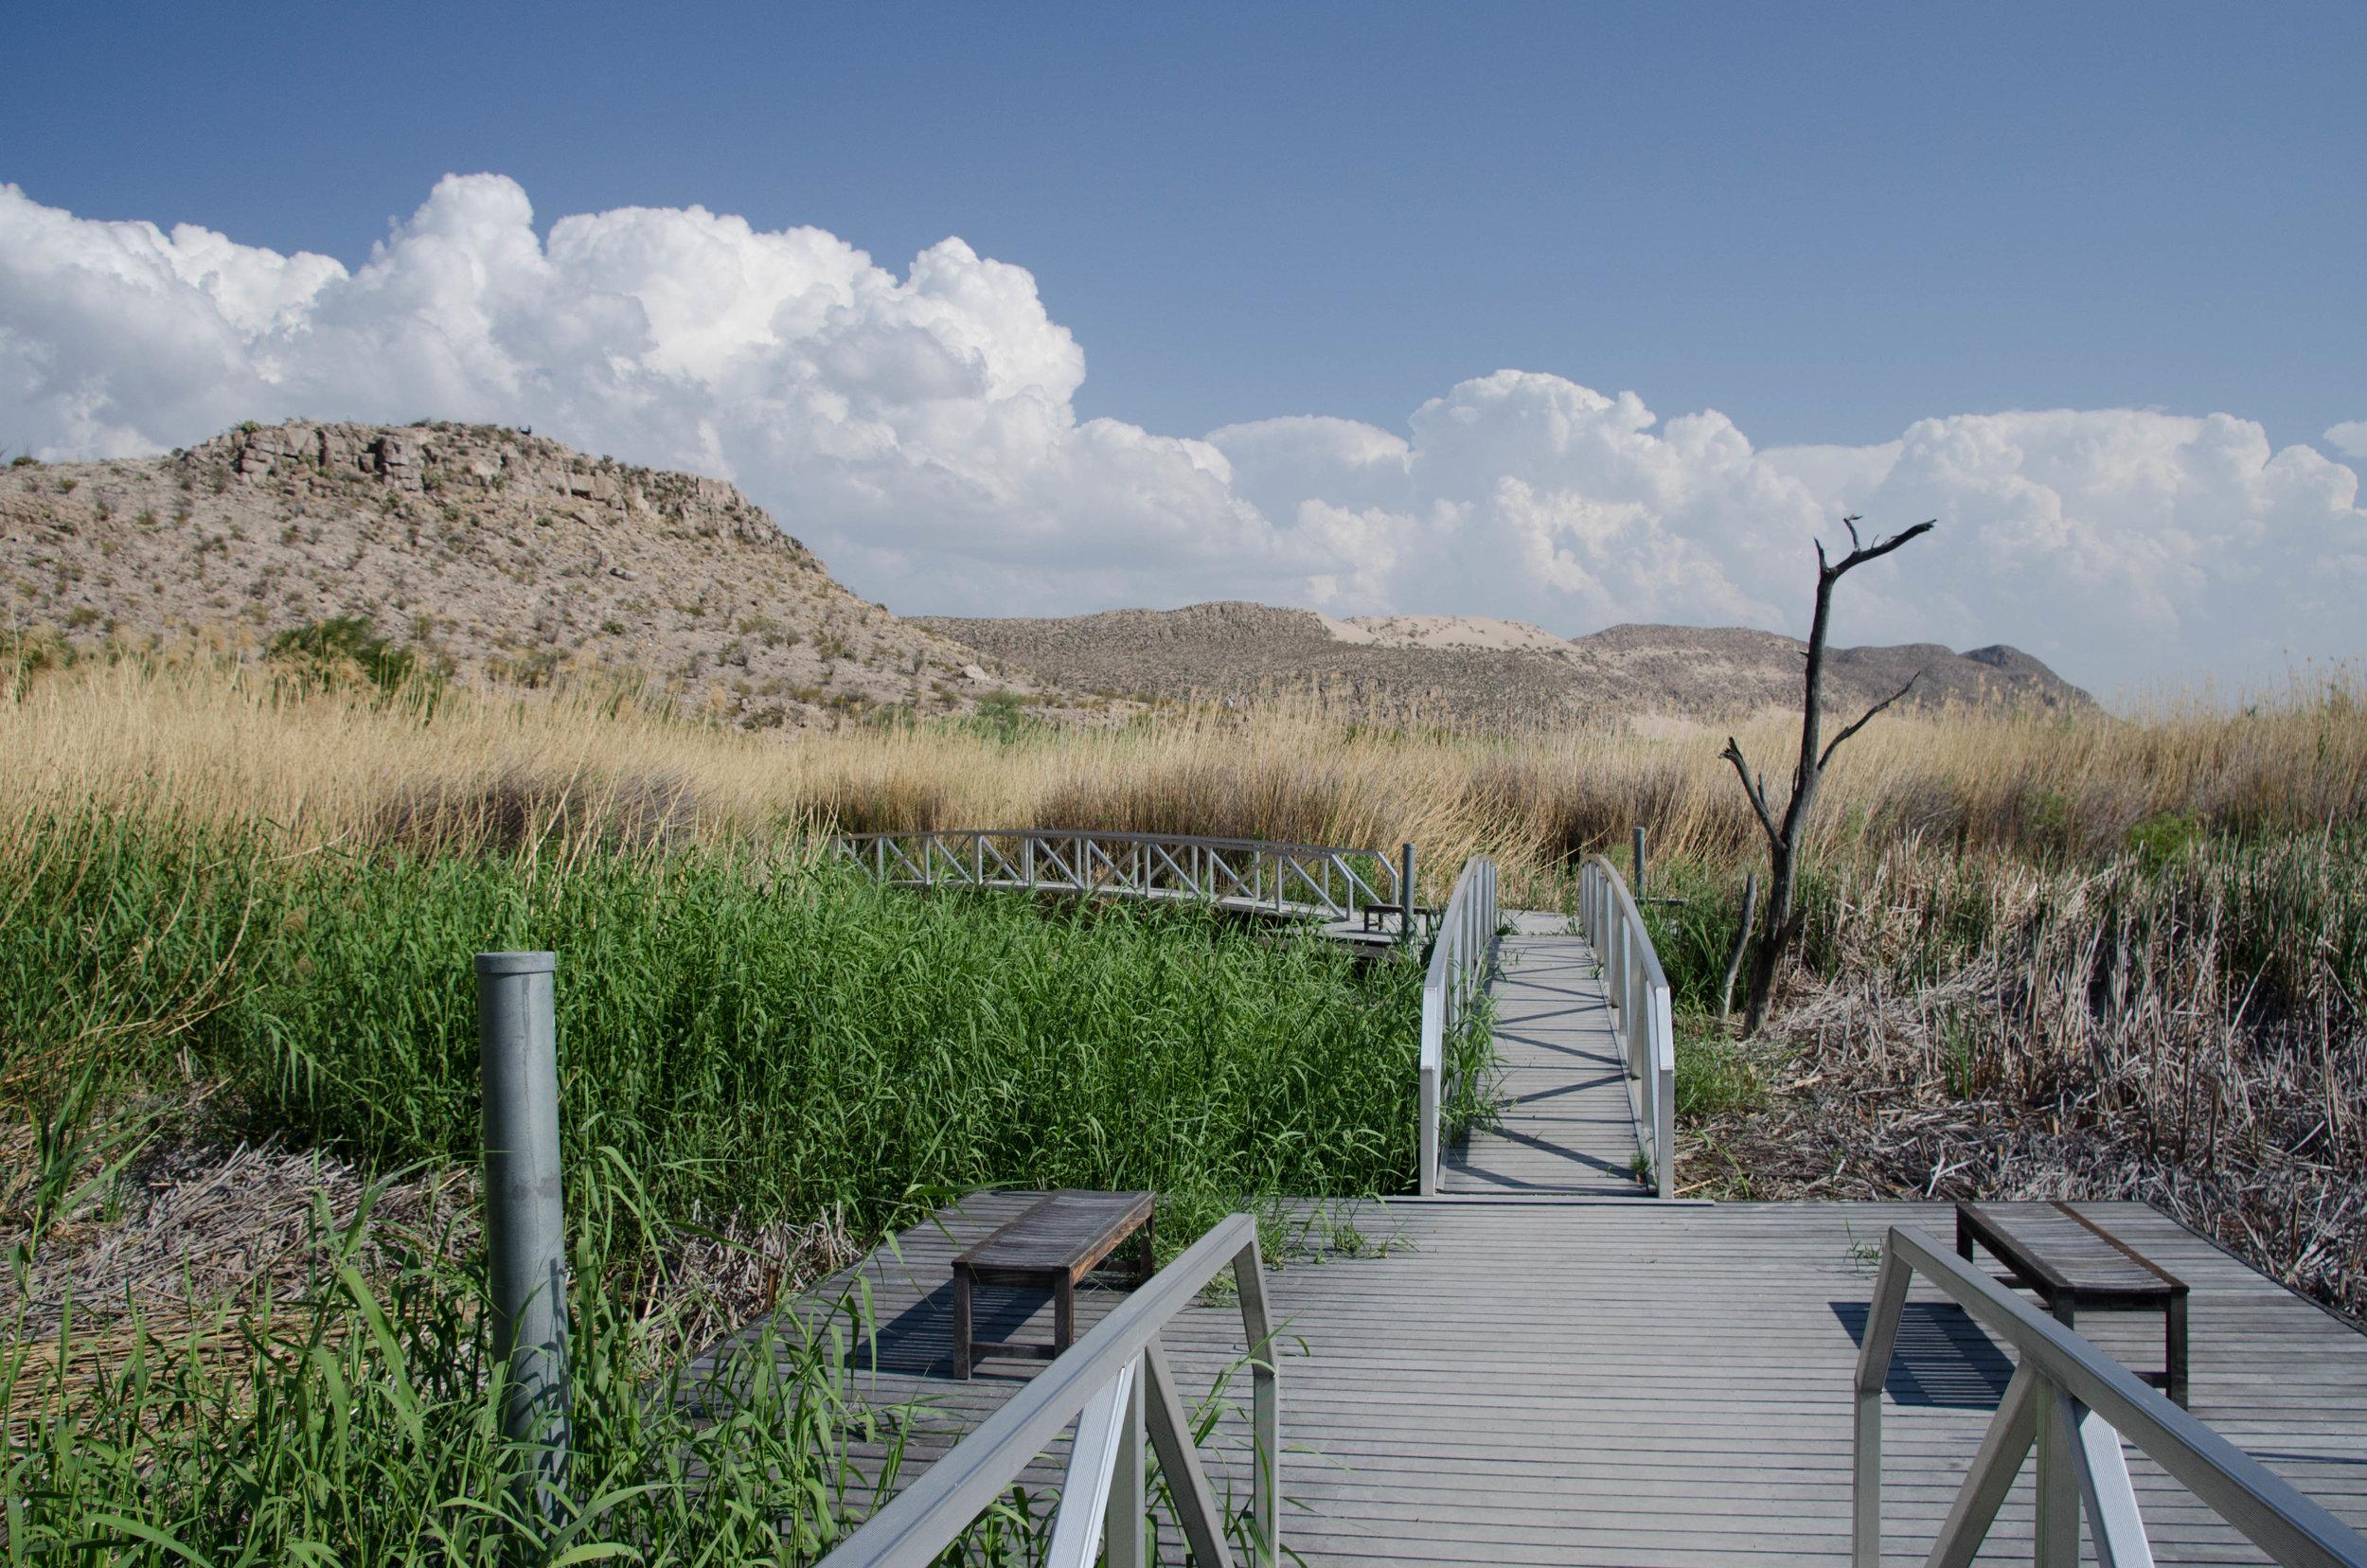 The nature center area